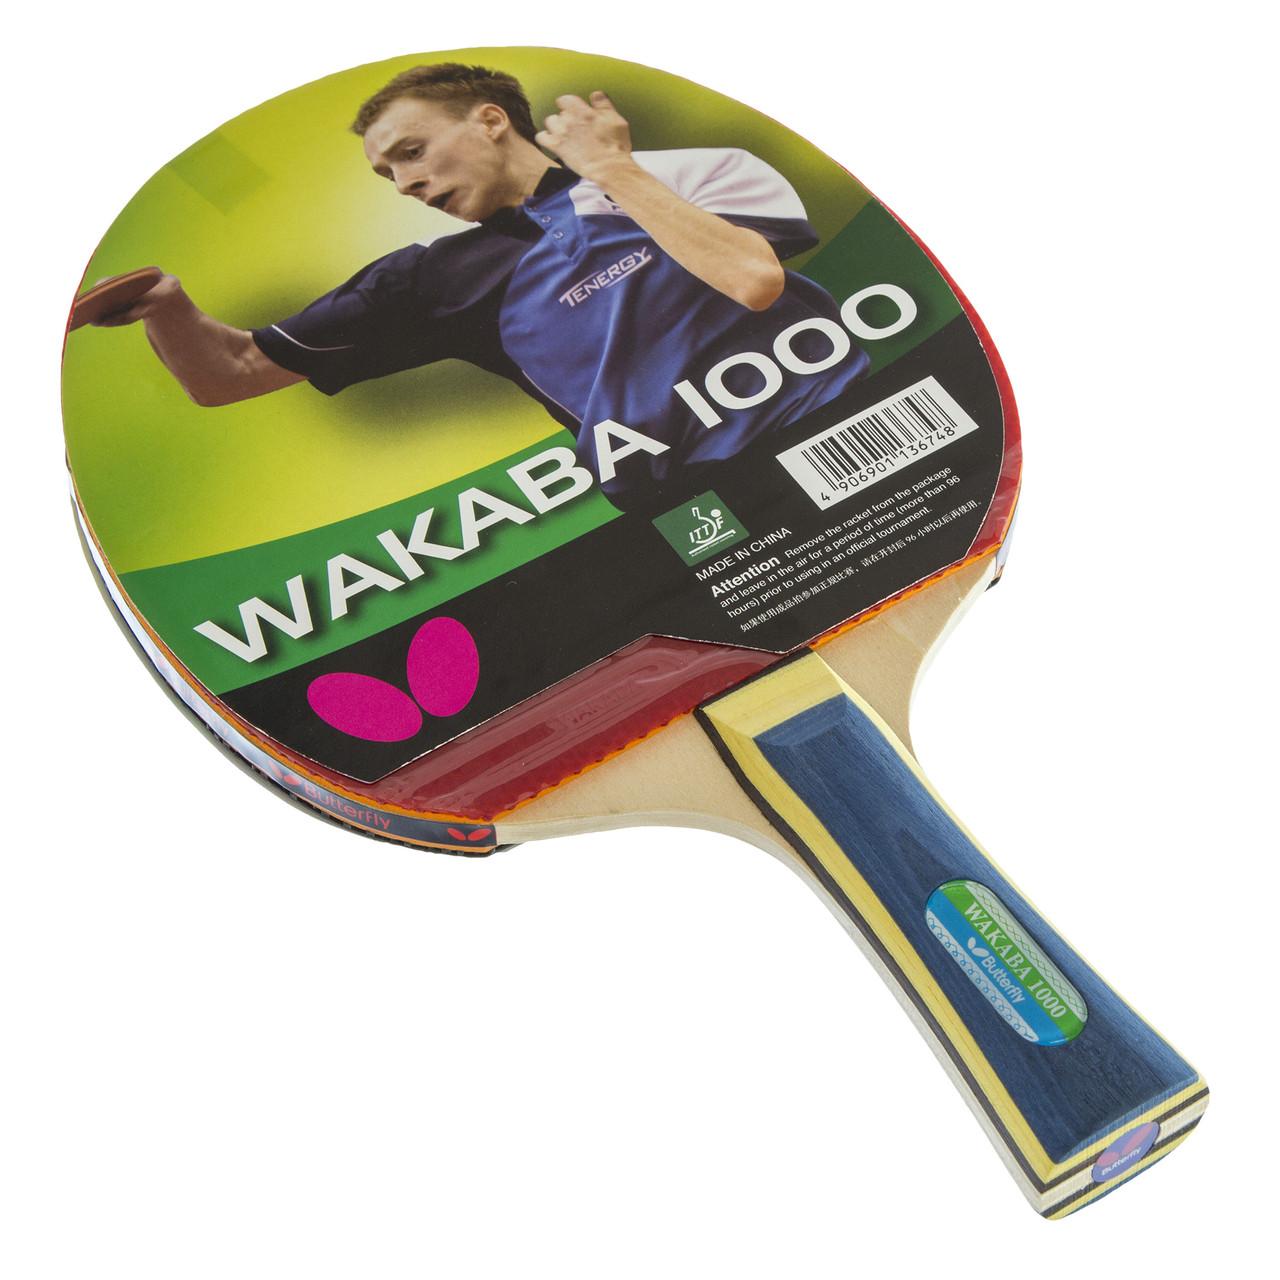 Ракетка для настольного тенниса 1 штука BUTTERFLY WAKABA-1000